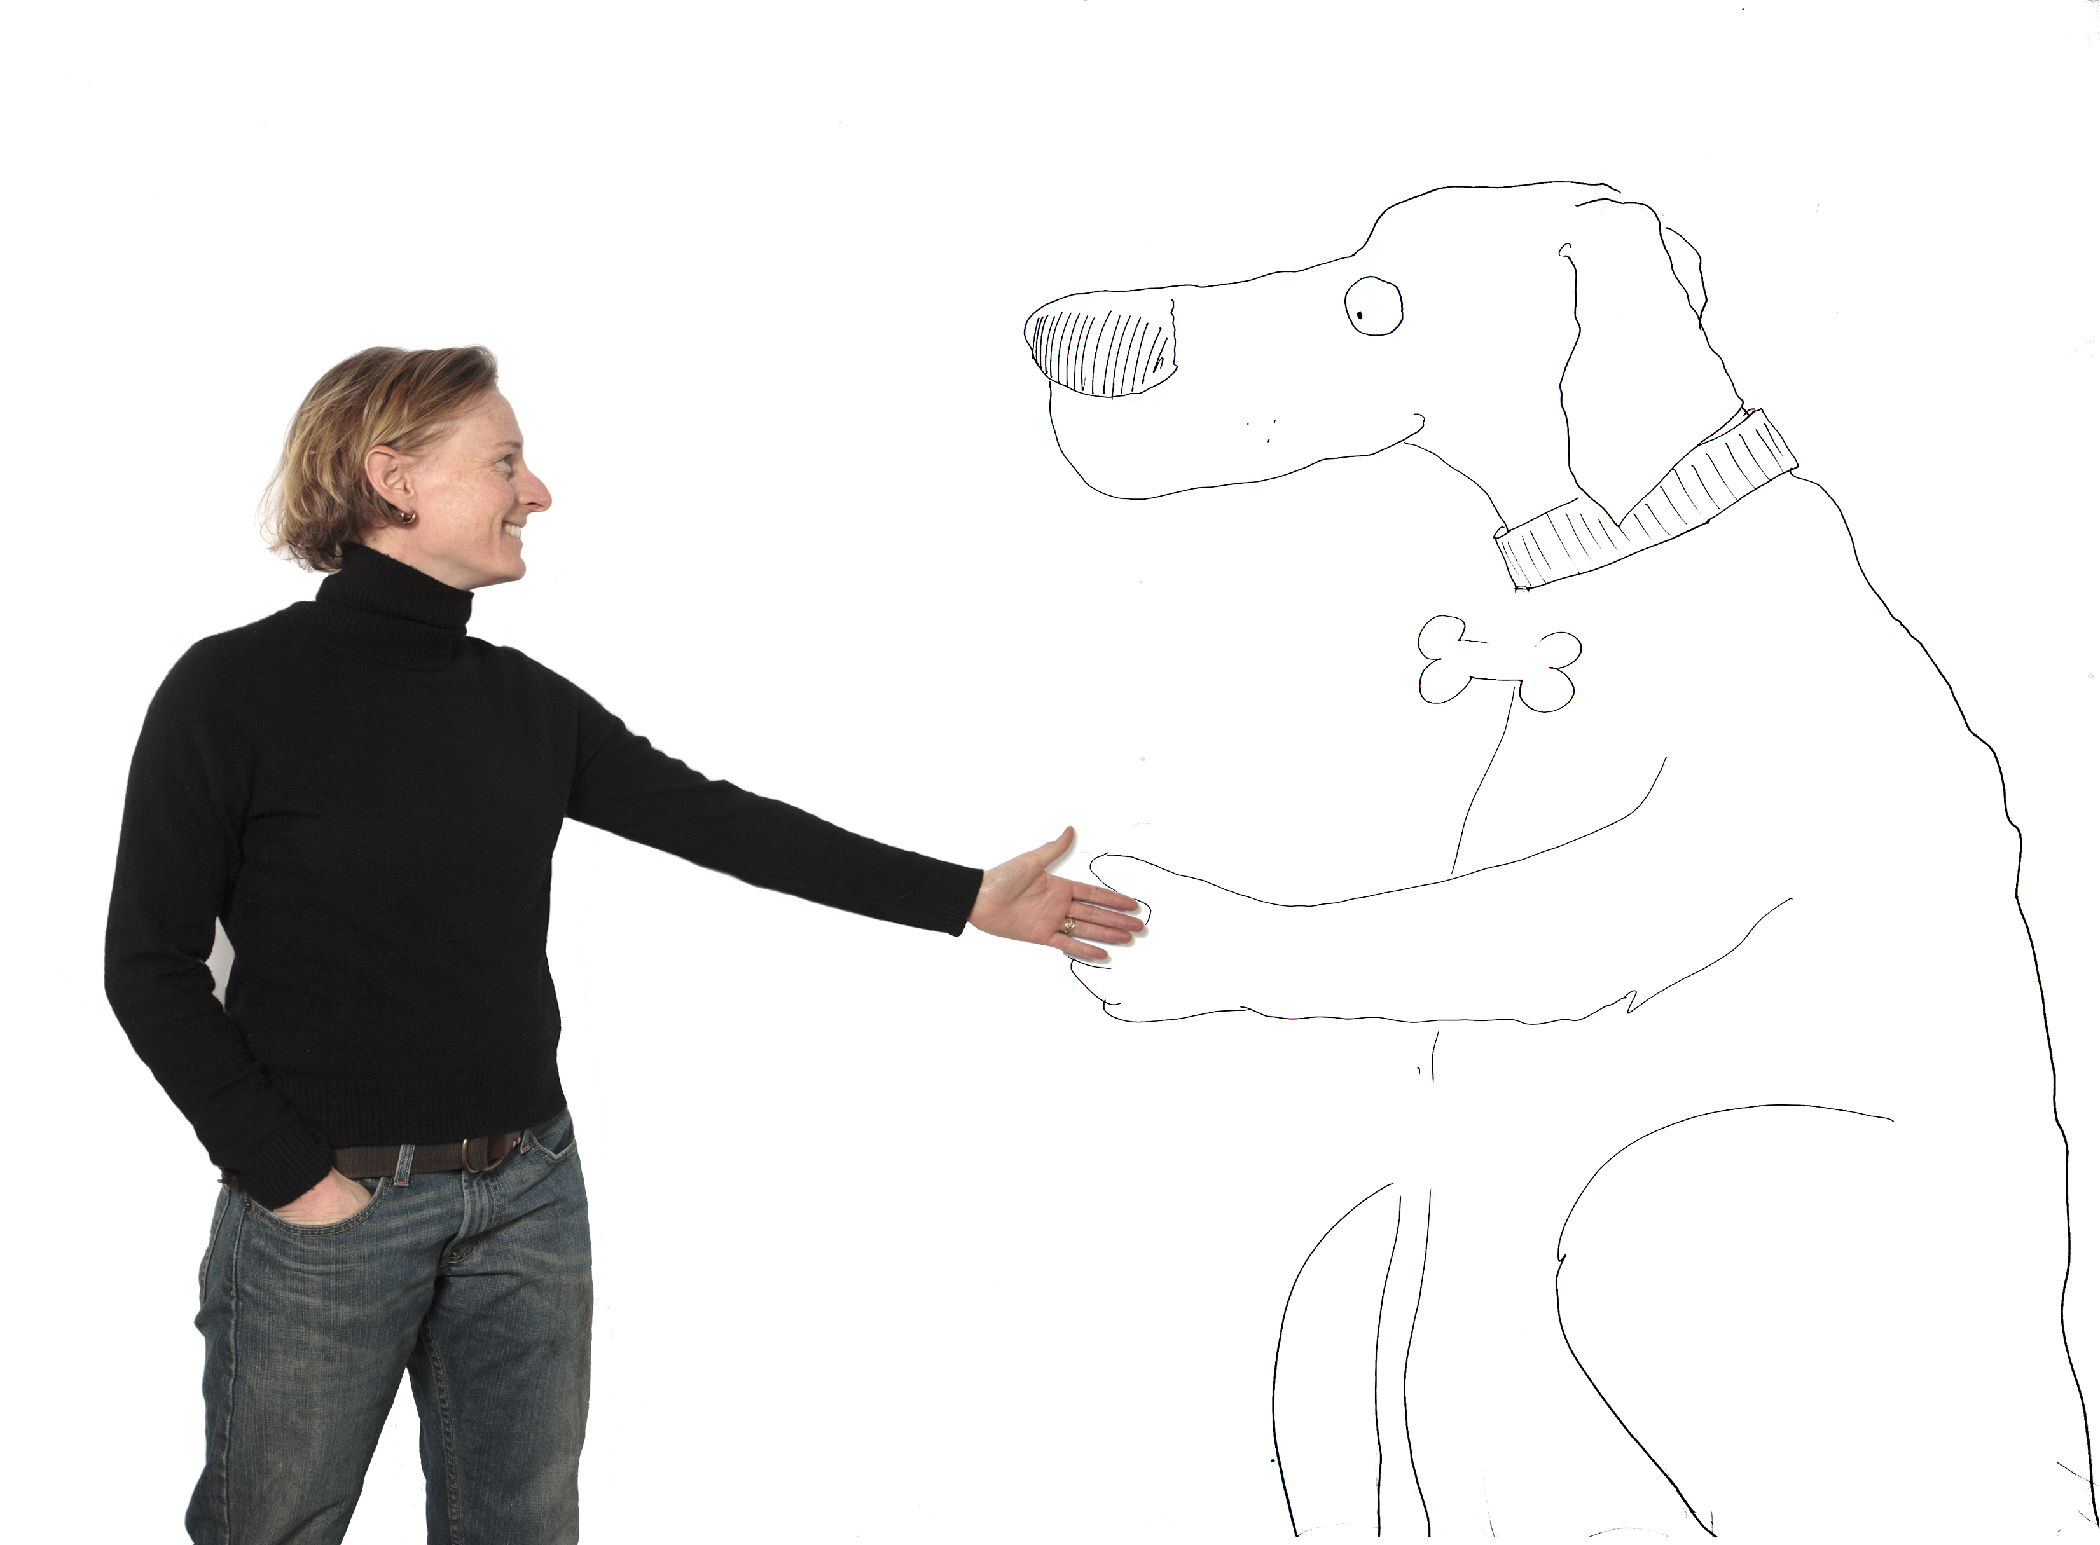 polar-dog-shaking-hands-hilary-price-comics-cartoons-cartoon-rhymeswithorange-rhymes-with-orange-speaker-storyteller-cartoonist-teacher